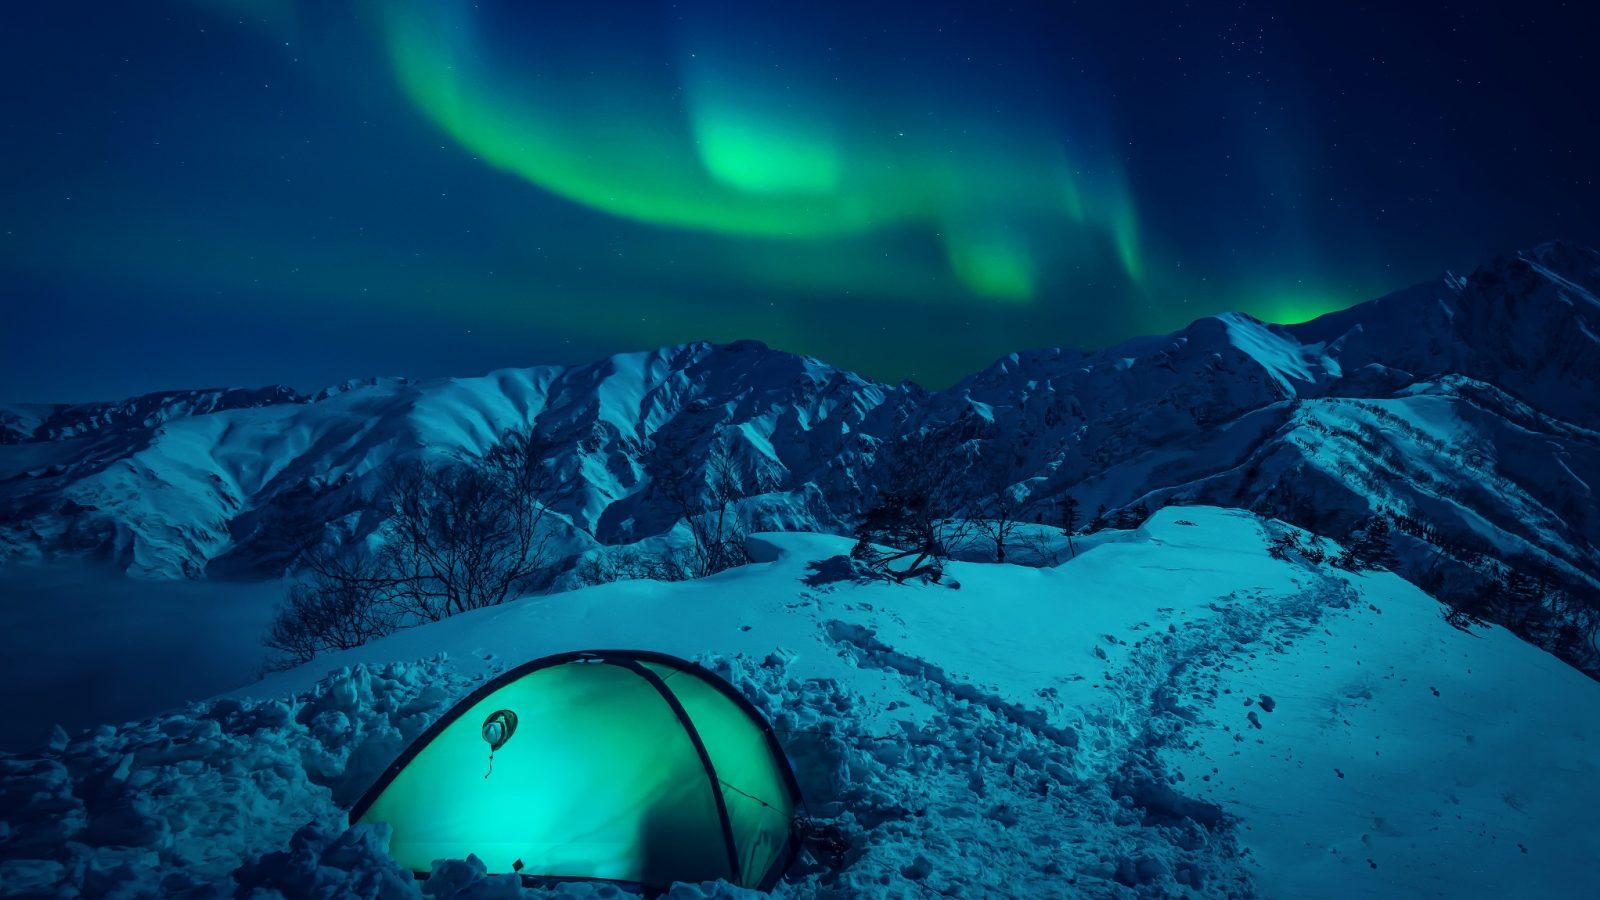 Wallpapers En Hd: The Northern Lights HD Wallpaper HD Wallpaper